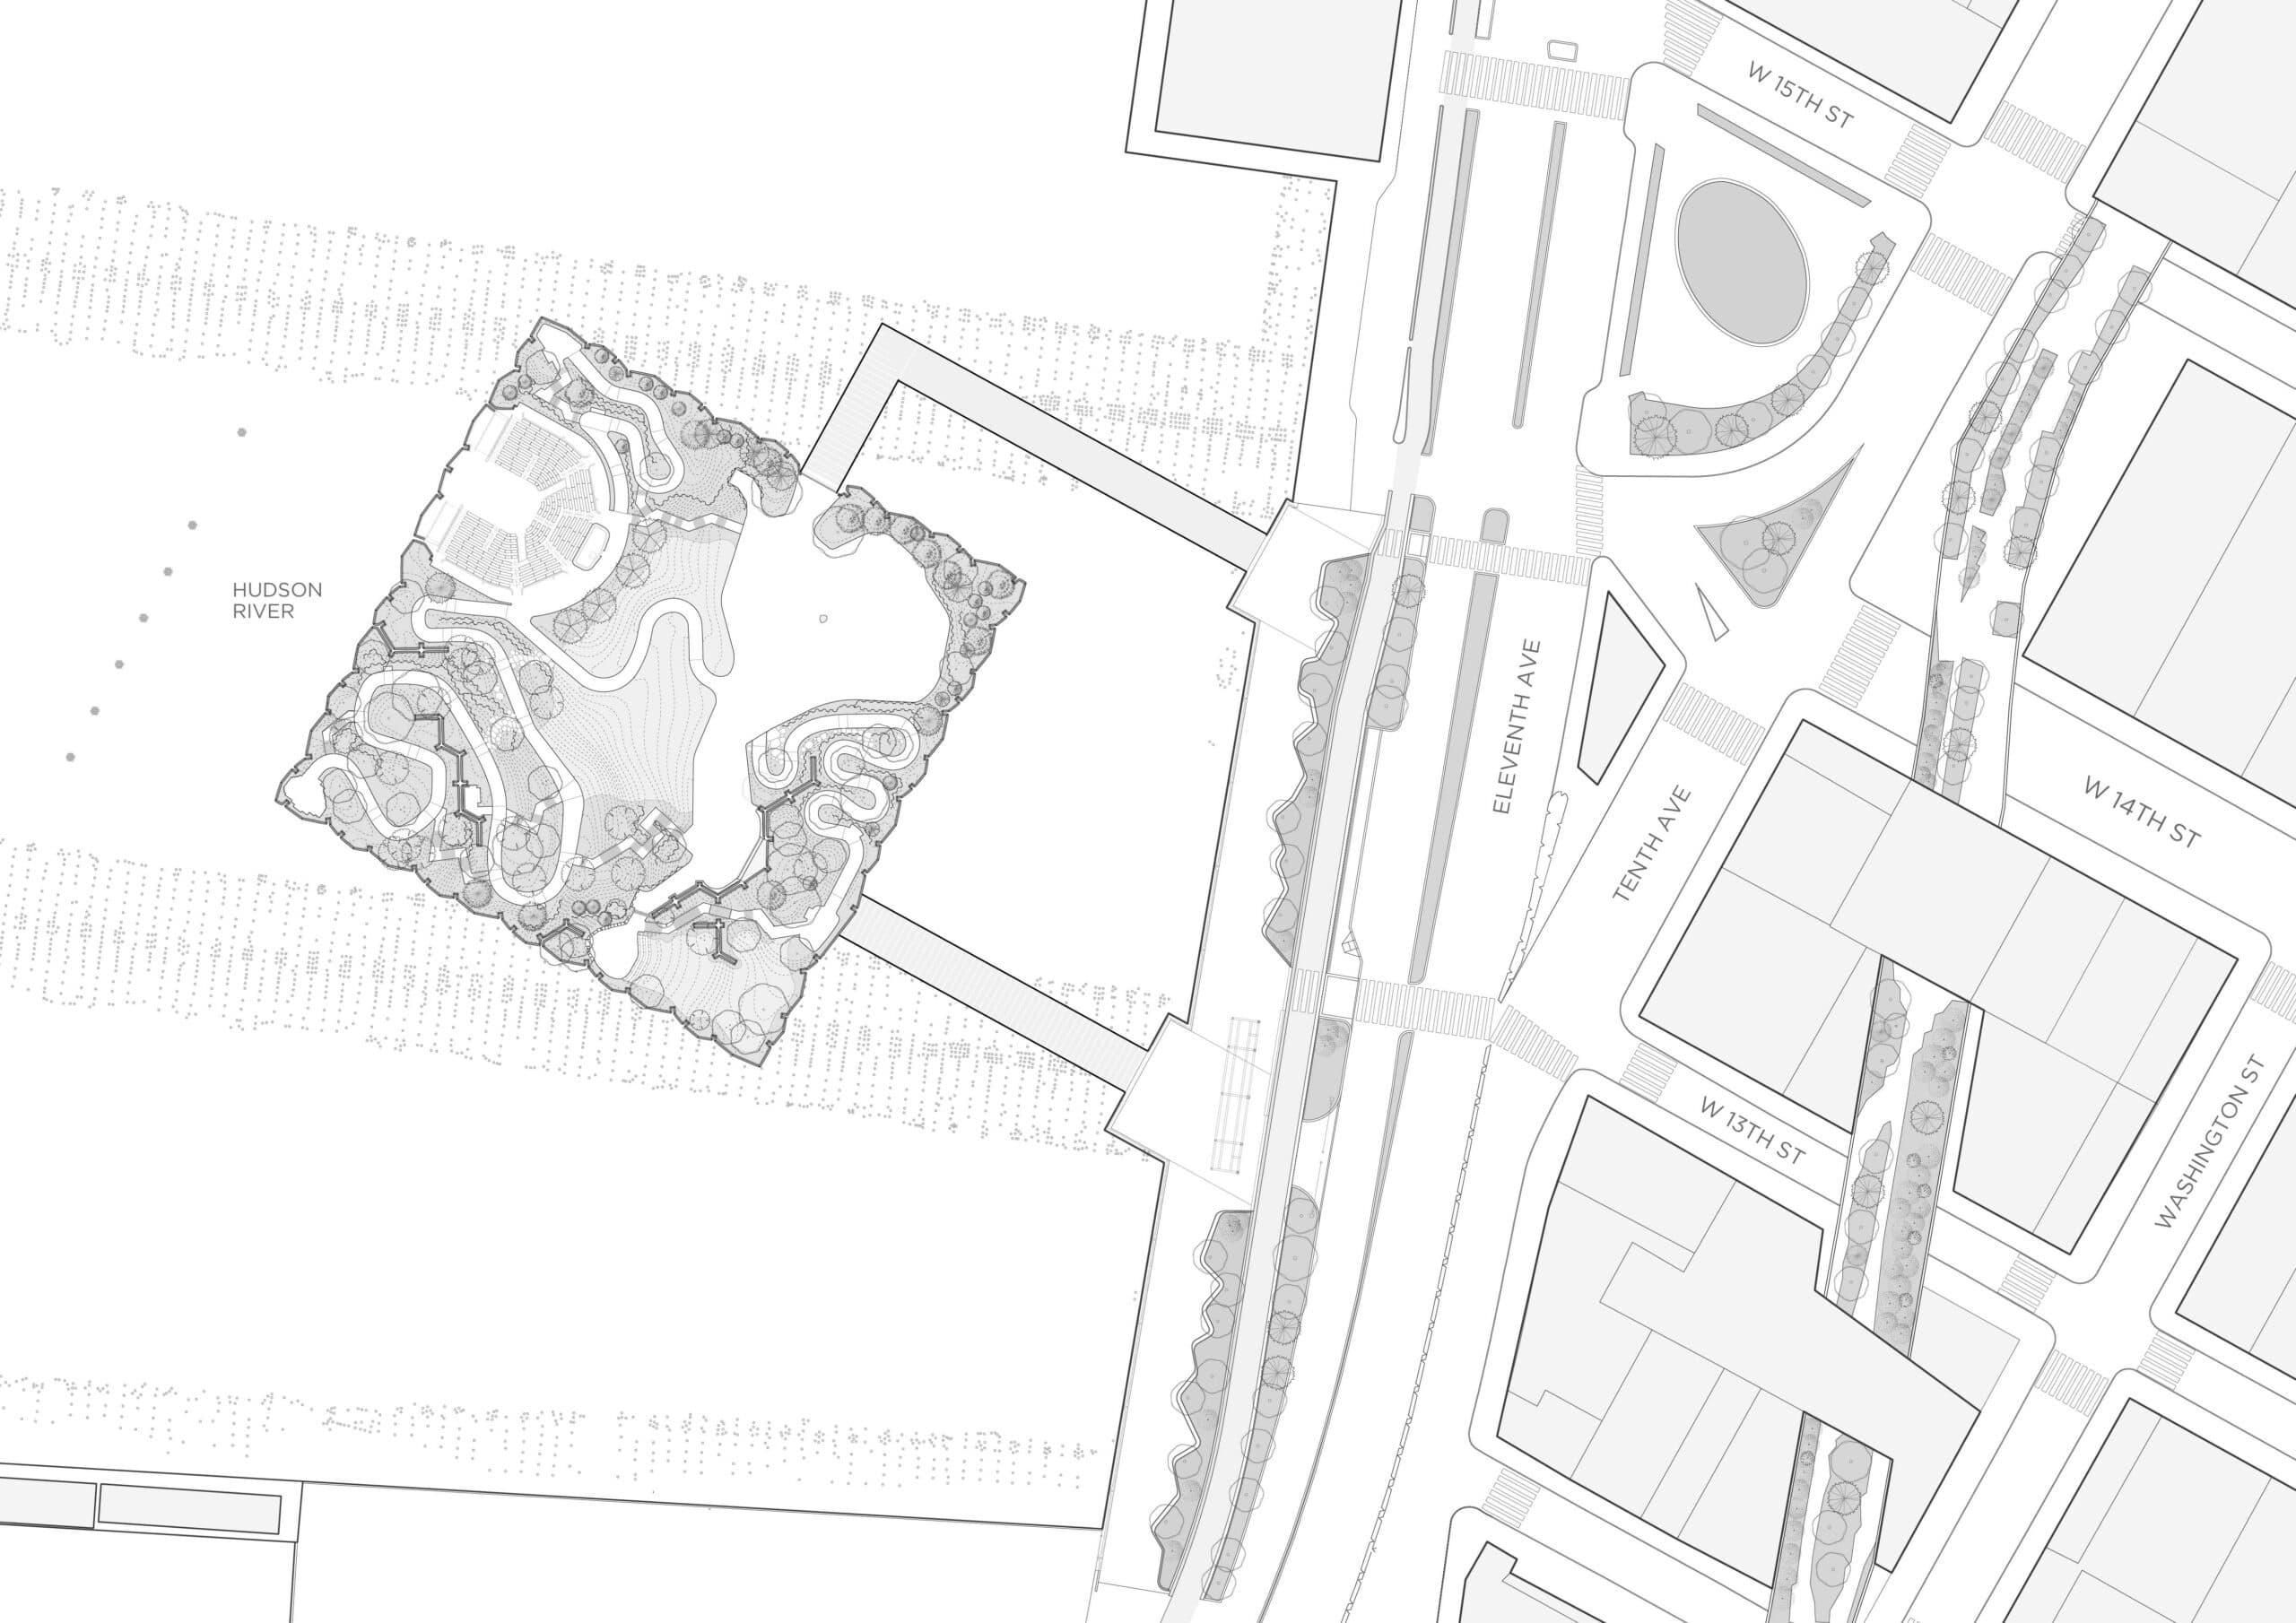 Little Island  - 05.1 Heatherwick Pier55LittleIsland scaled 42